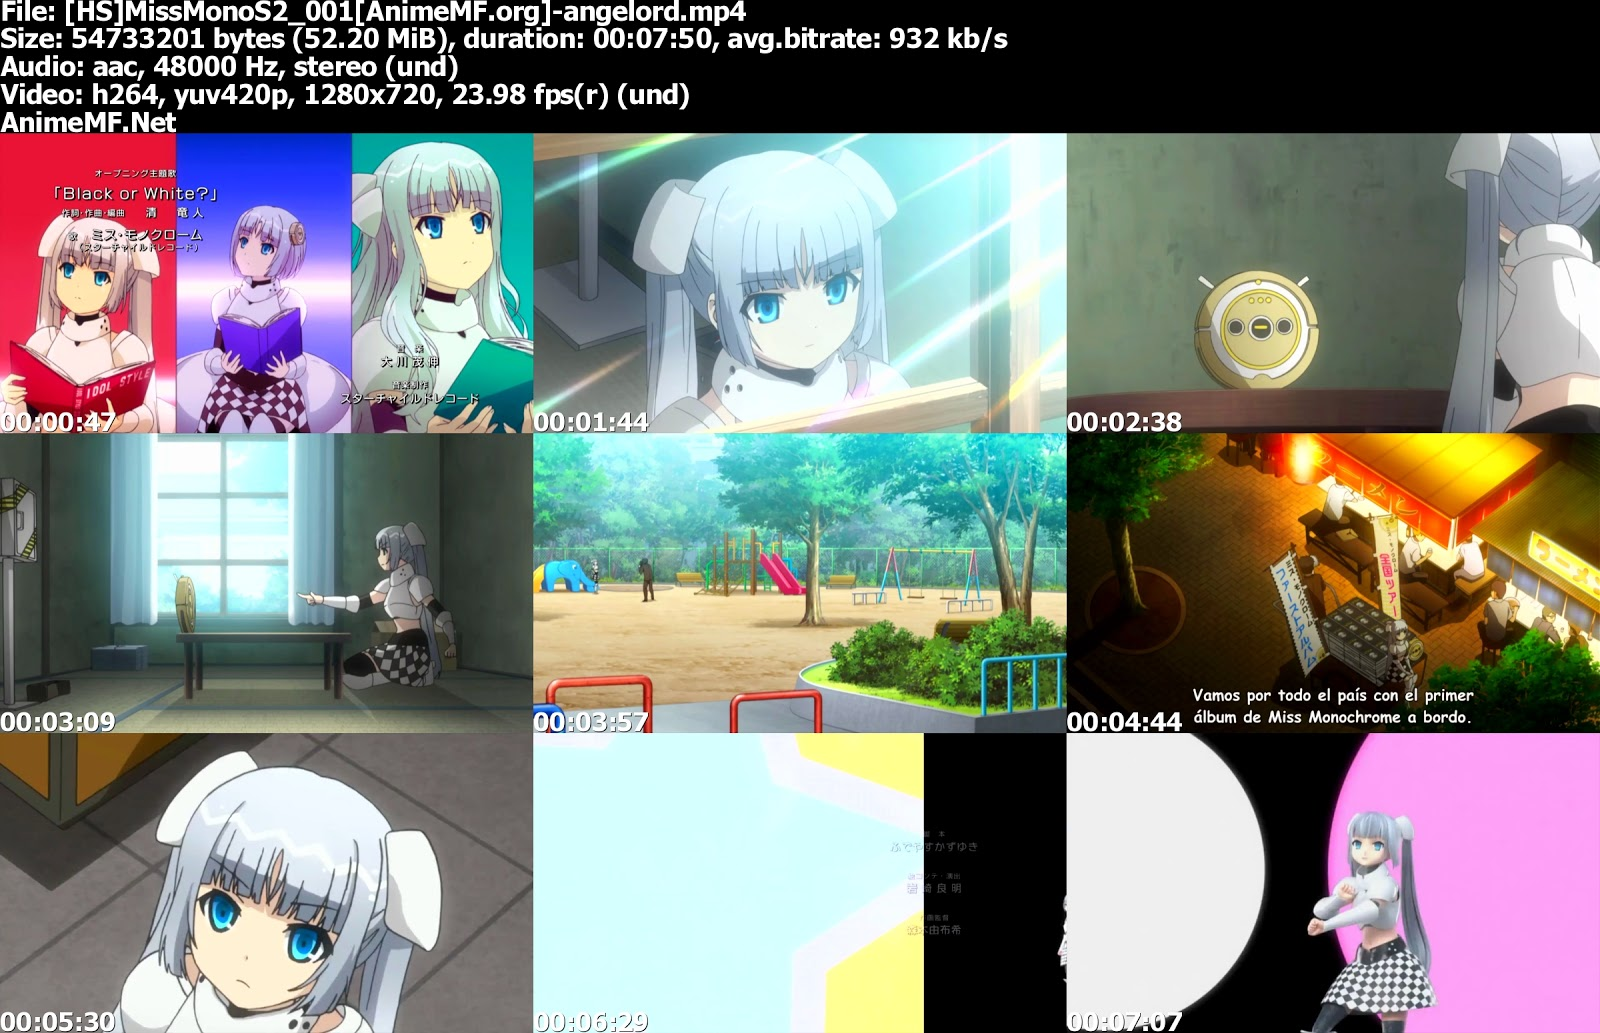 Miss Monochrome: The Animation 2